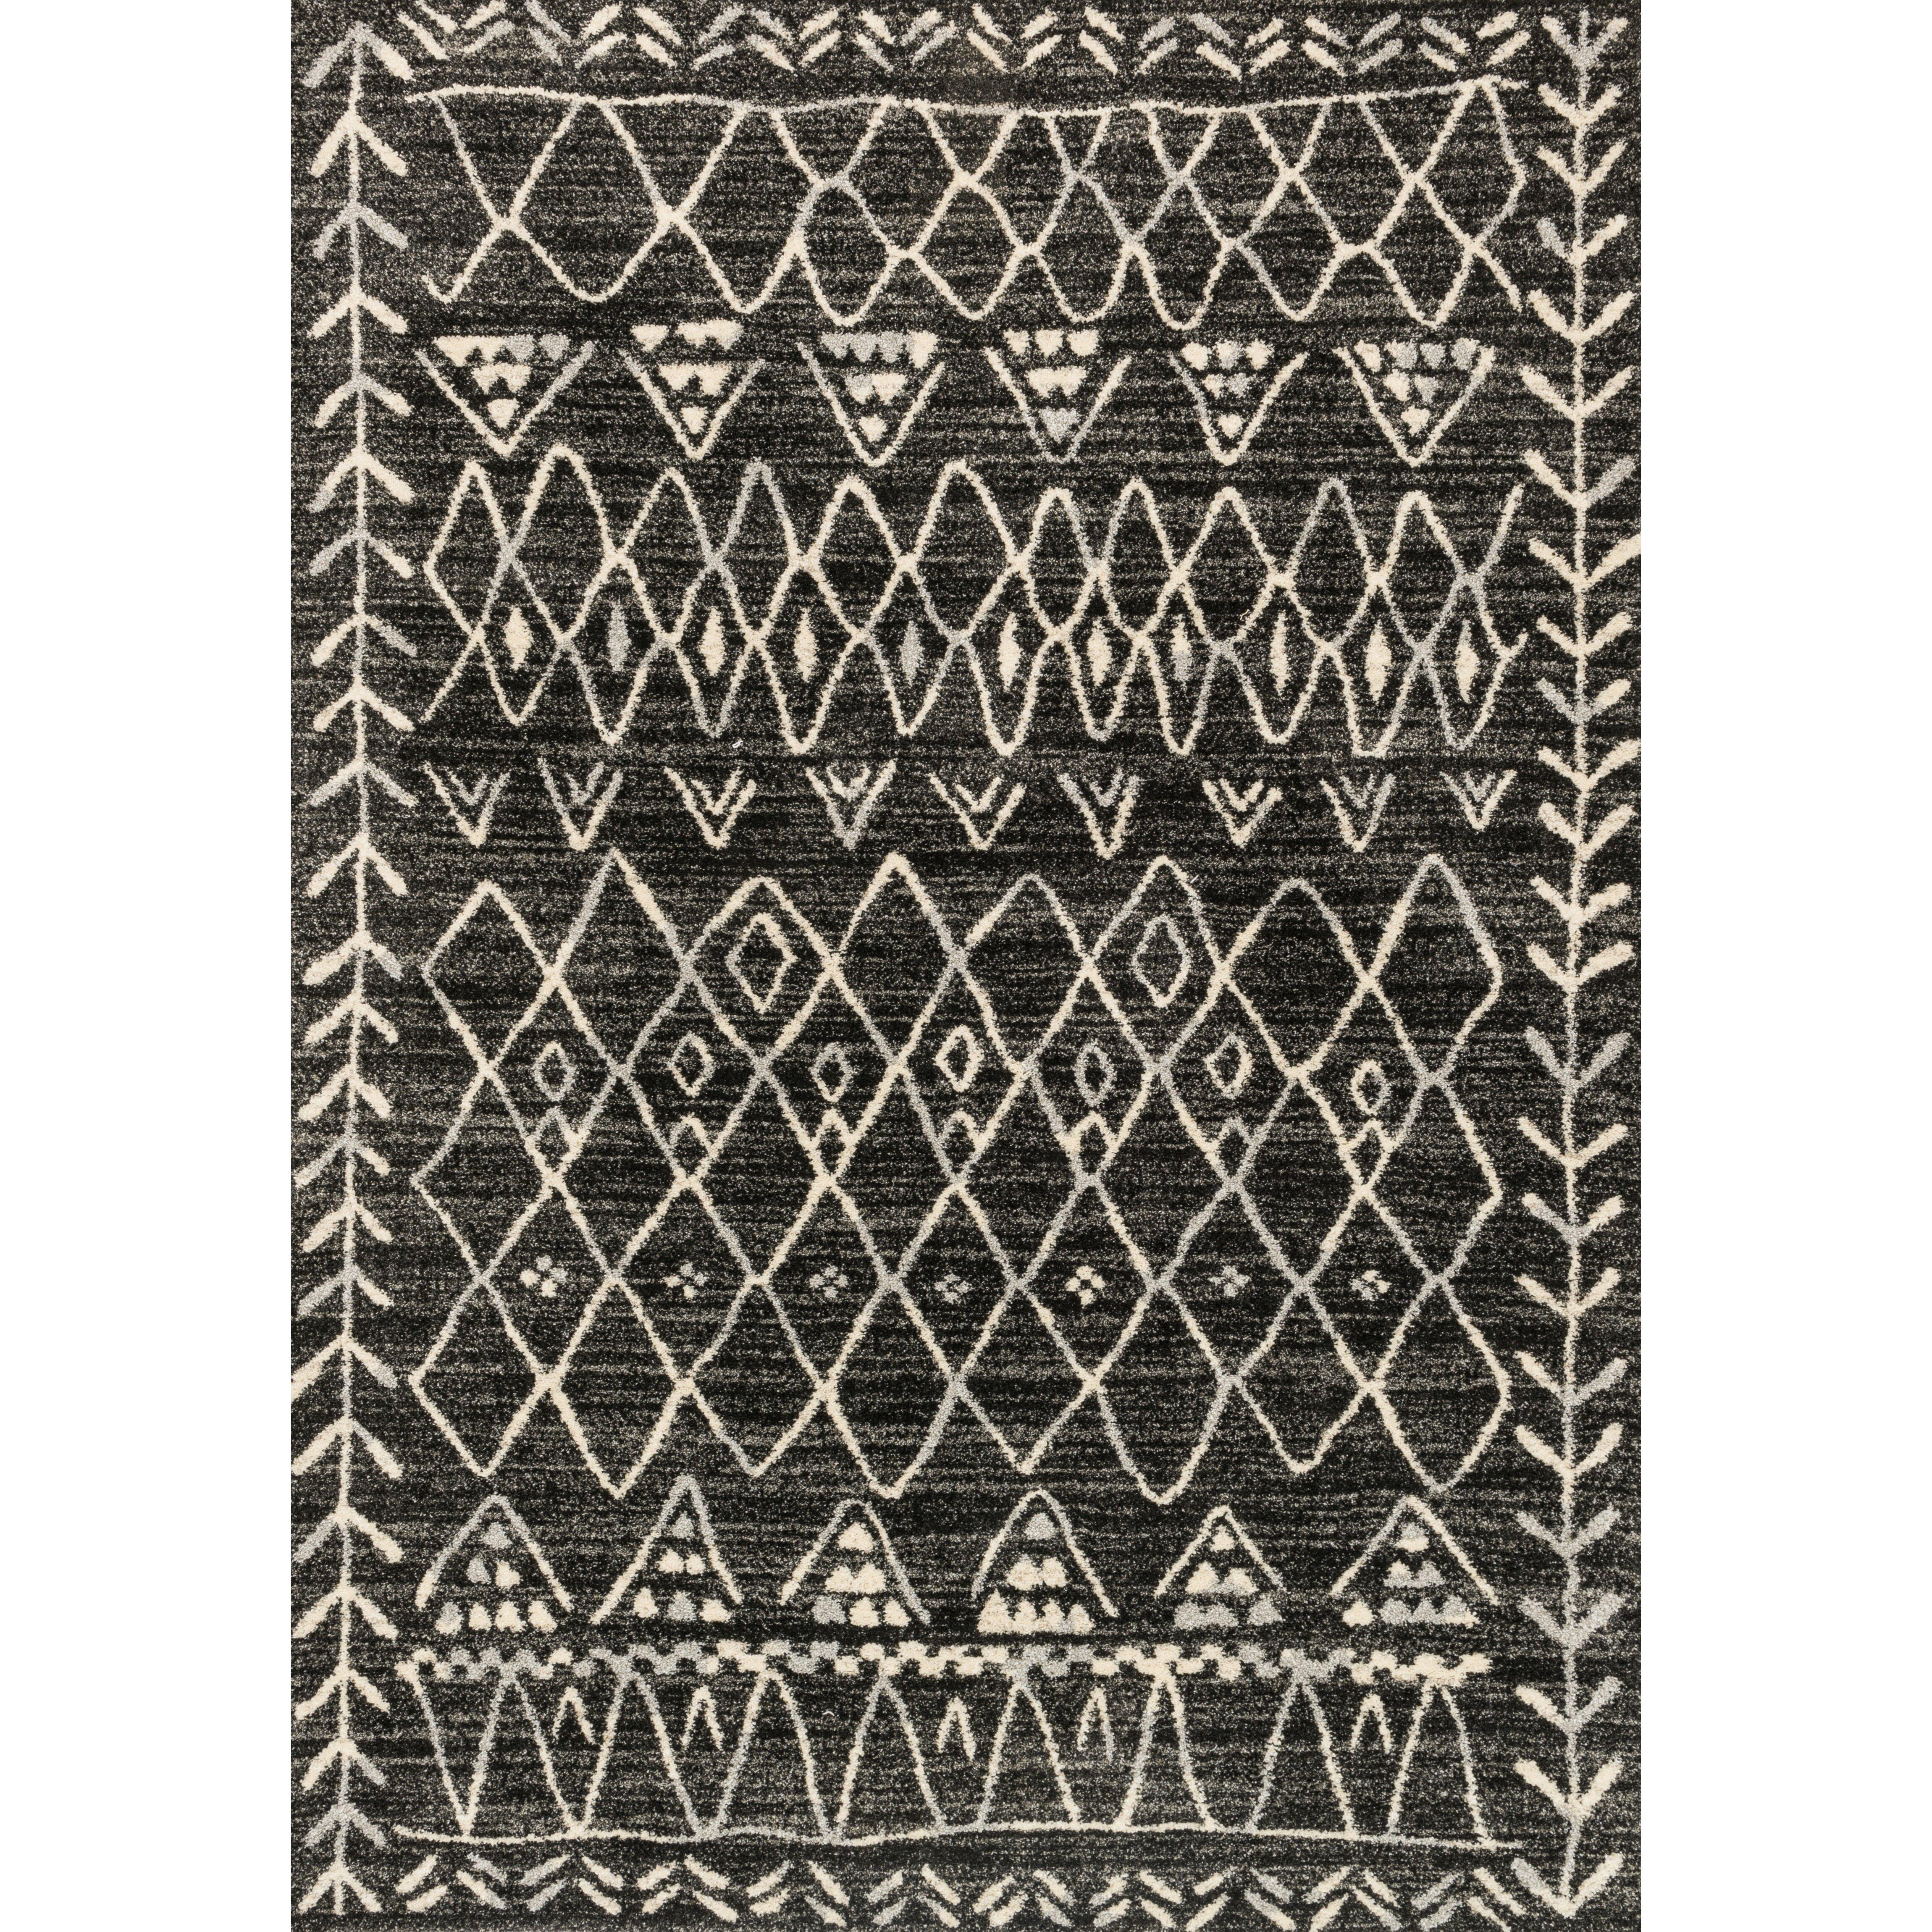 High Quality Loloi Rugs Emory Black Ivory Area Rug Reviews Wayfair